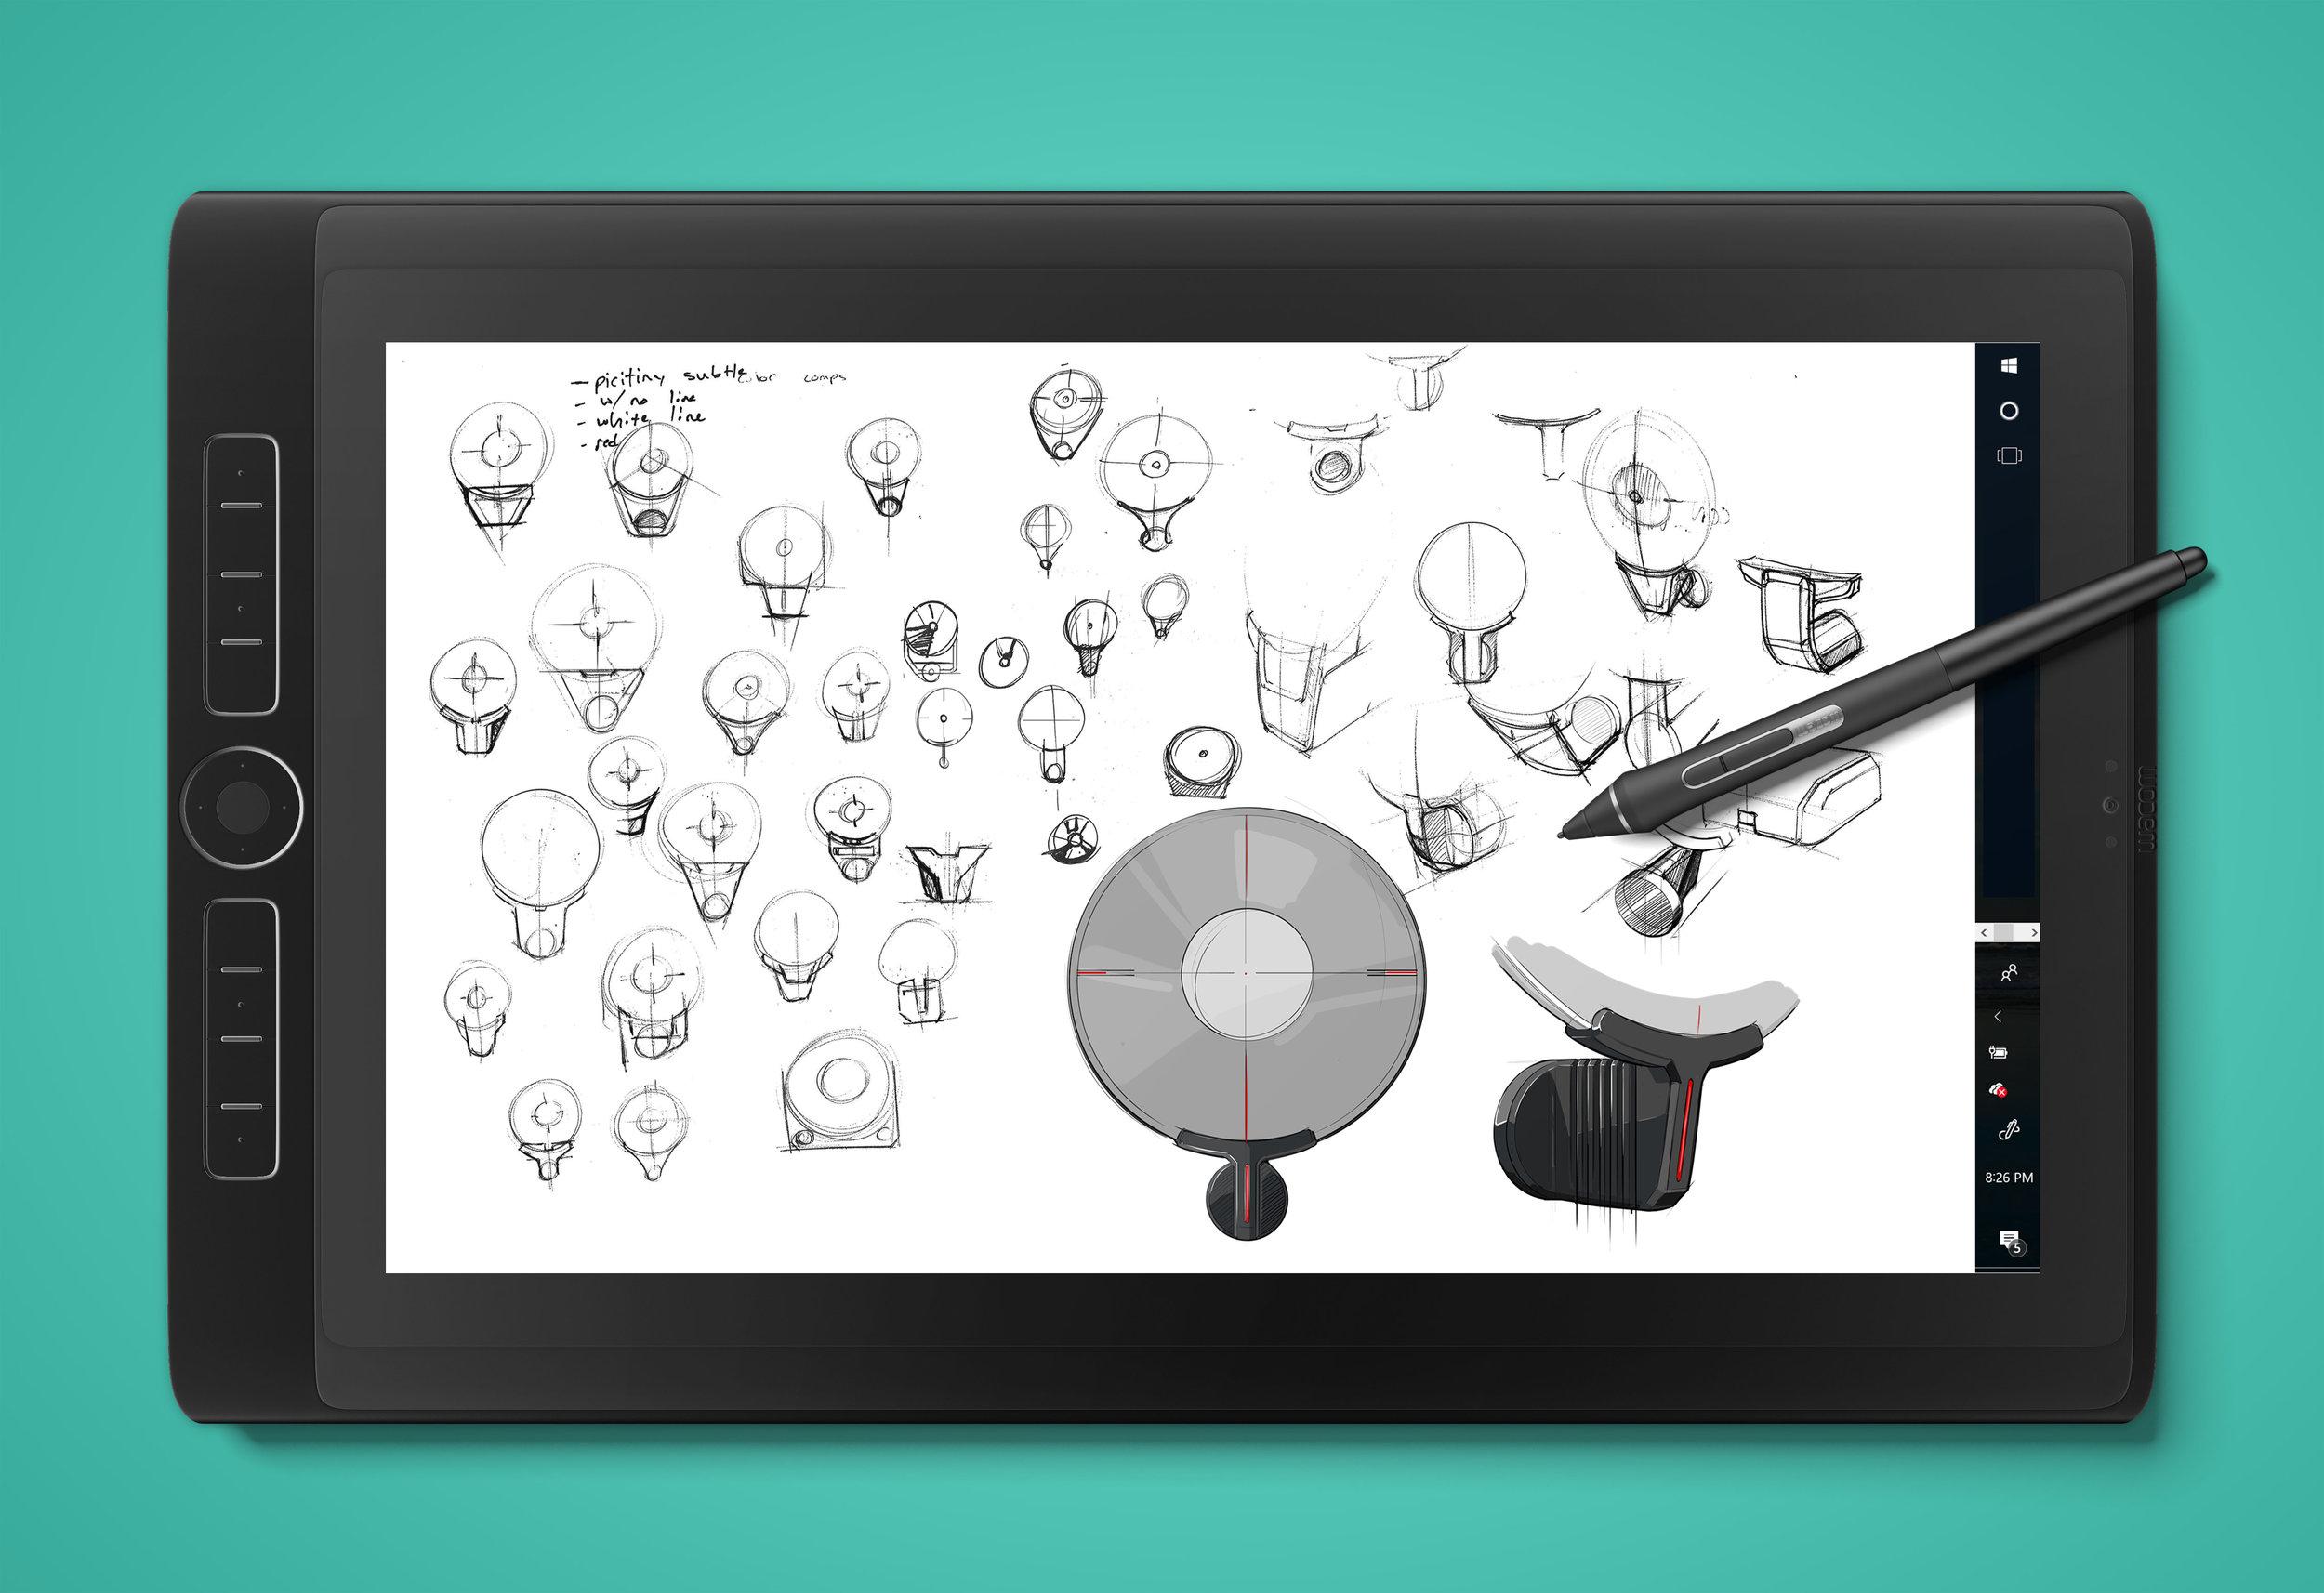 Wacom-Tablet-w-Stylus-Undesigns.jpg